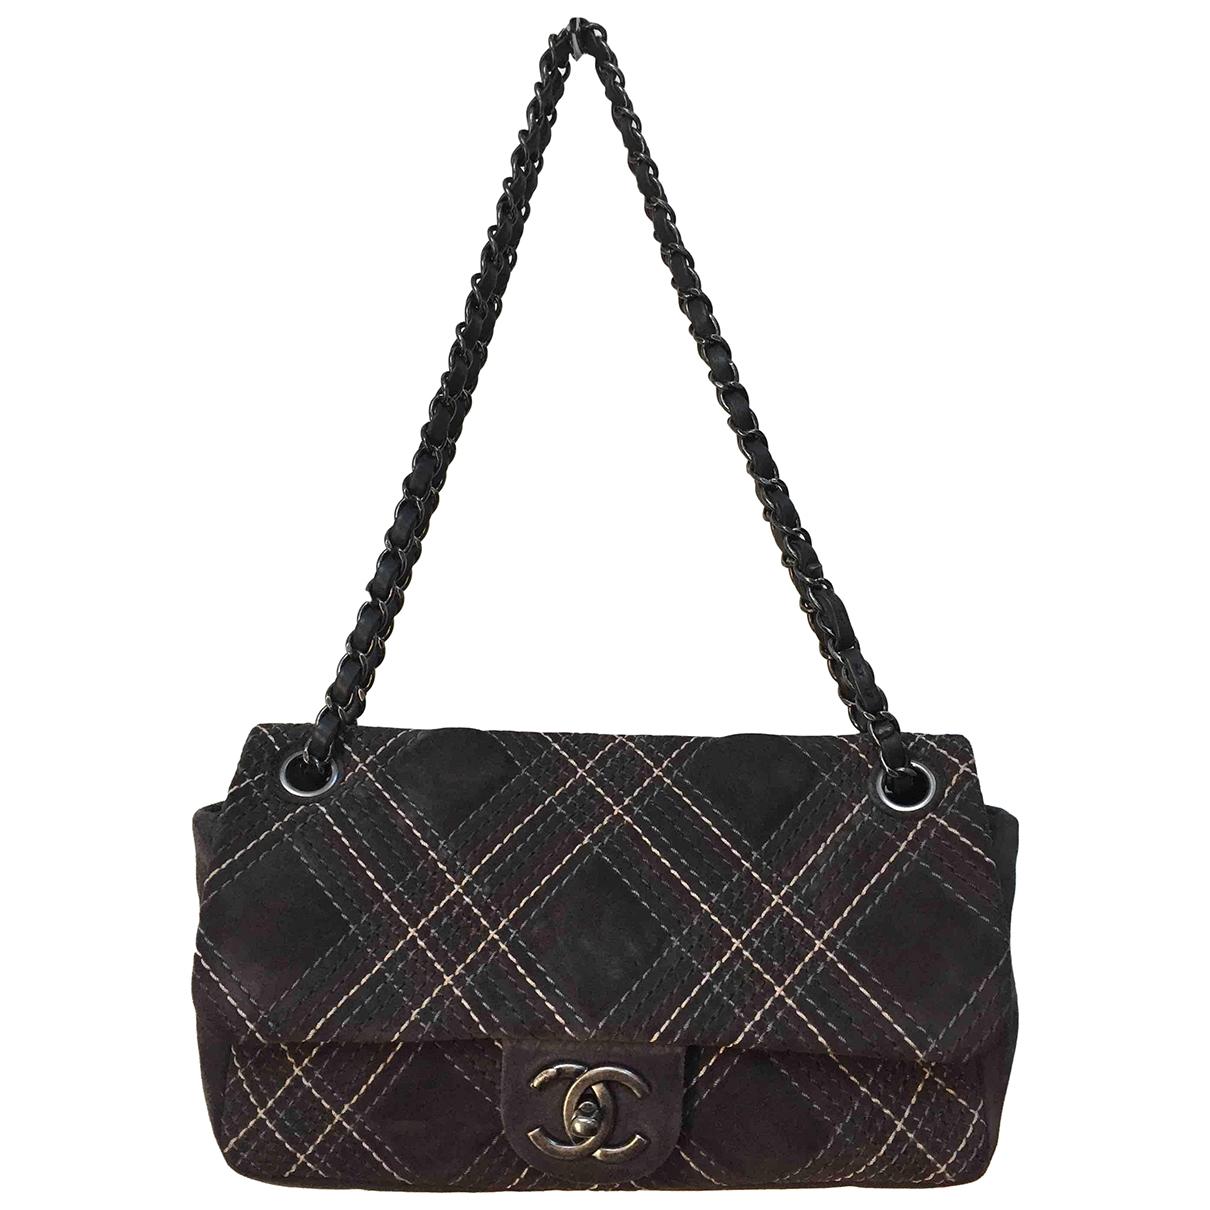 Chanel Timeless/Classique Handtasche in  Grau Veloursleder